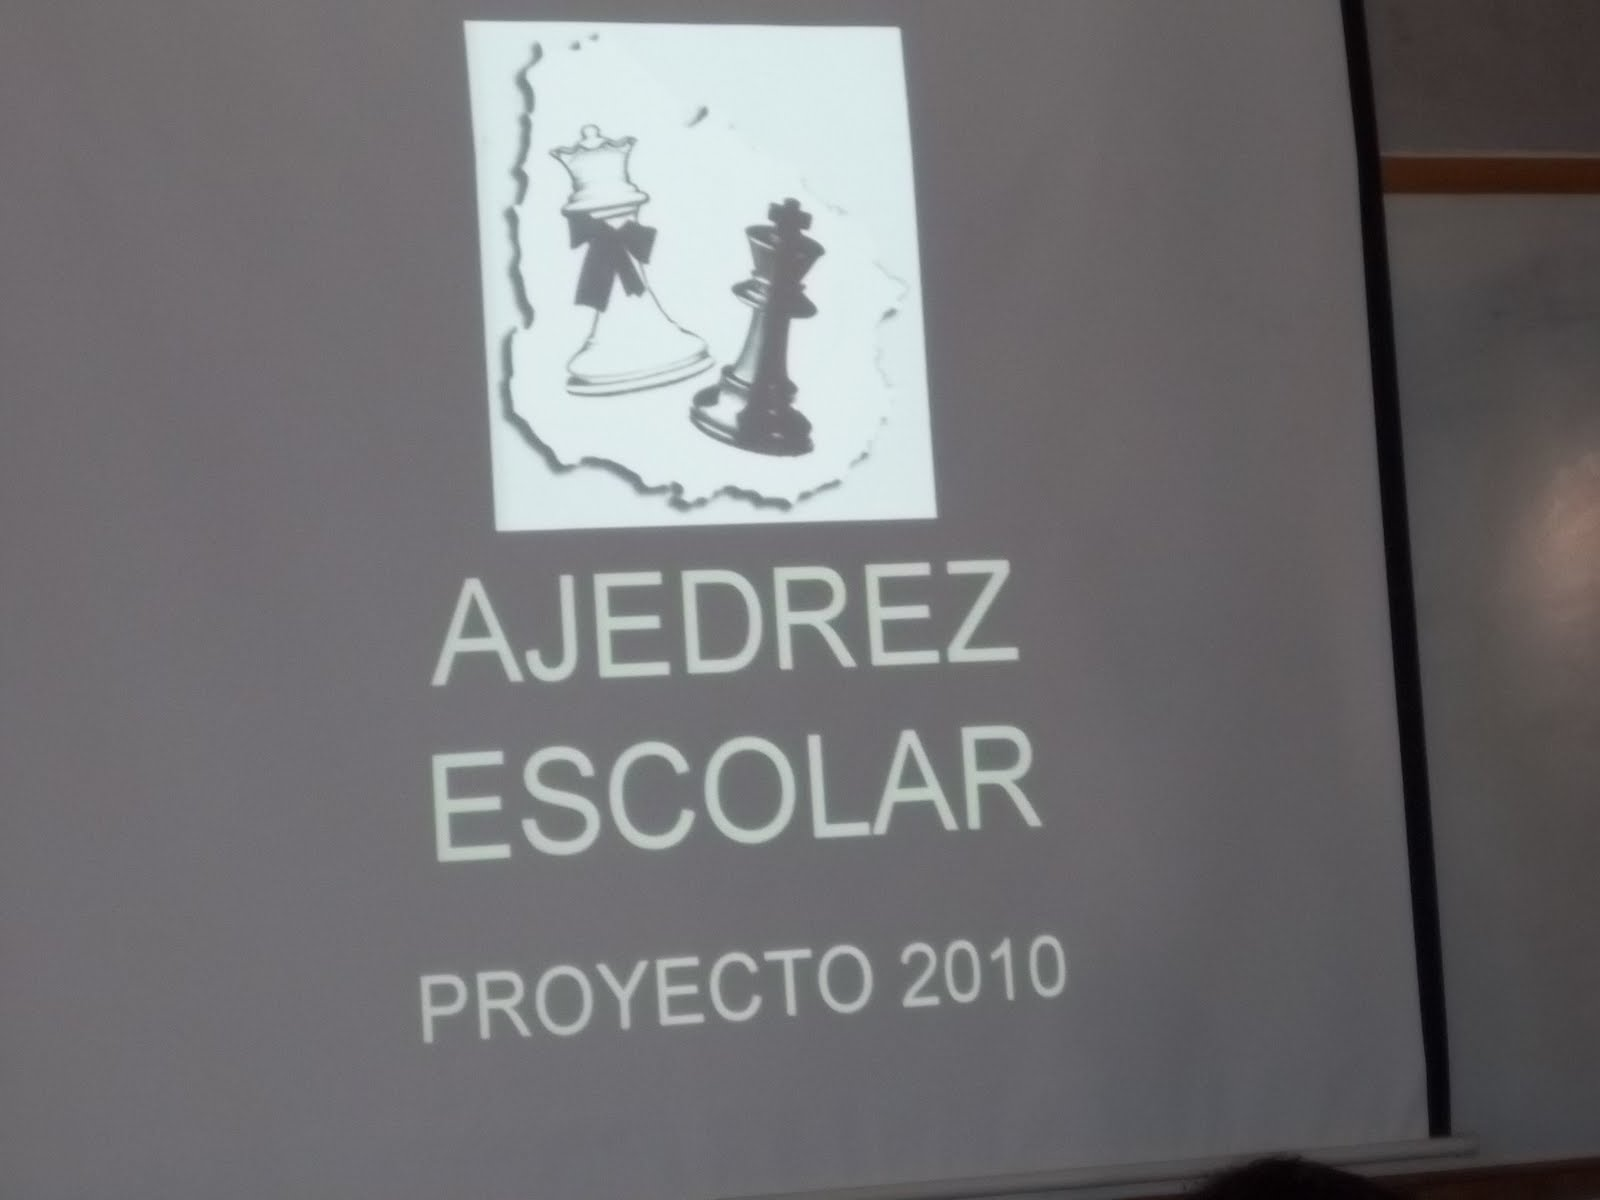 Taller De Ajedrez Chaturanga Ajedrez Escolar Proyecto 2010